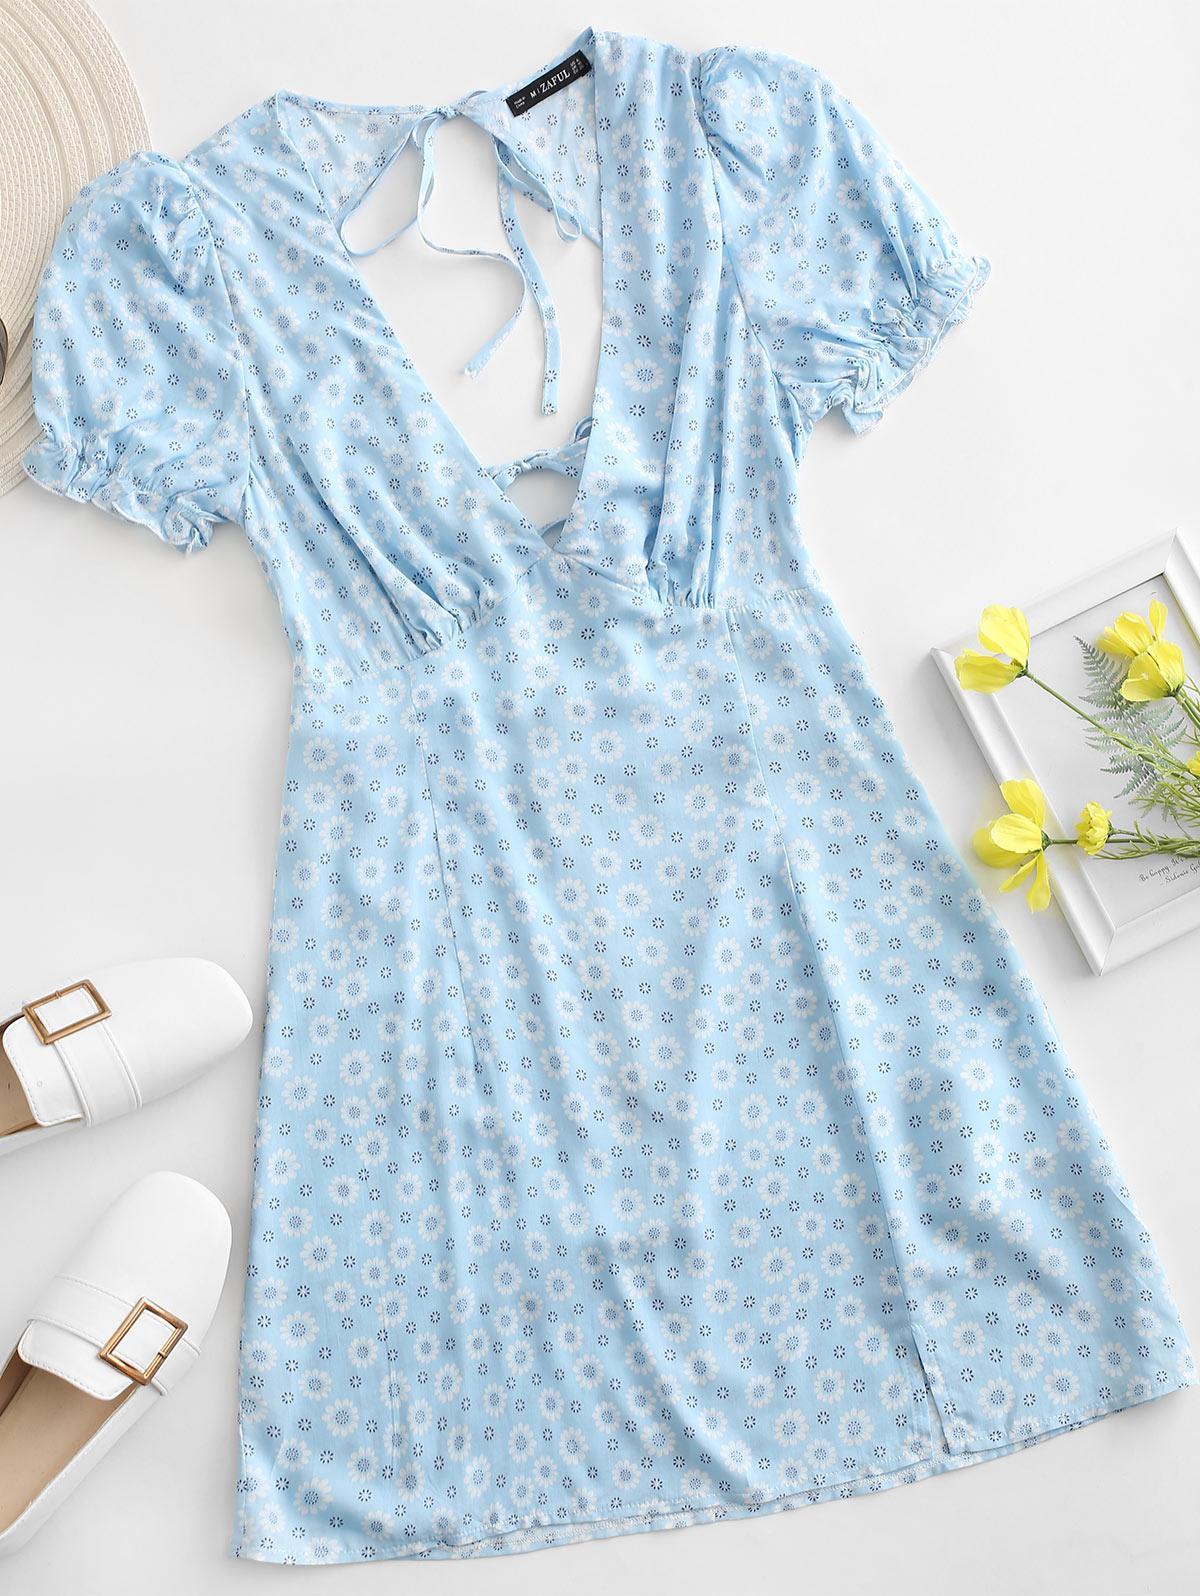 ZAFUL Ditsy Floral Low Cut Tie Cutout Slit Dress